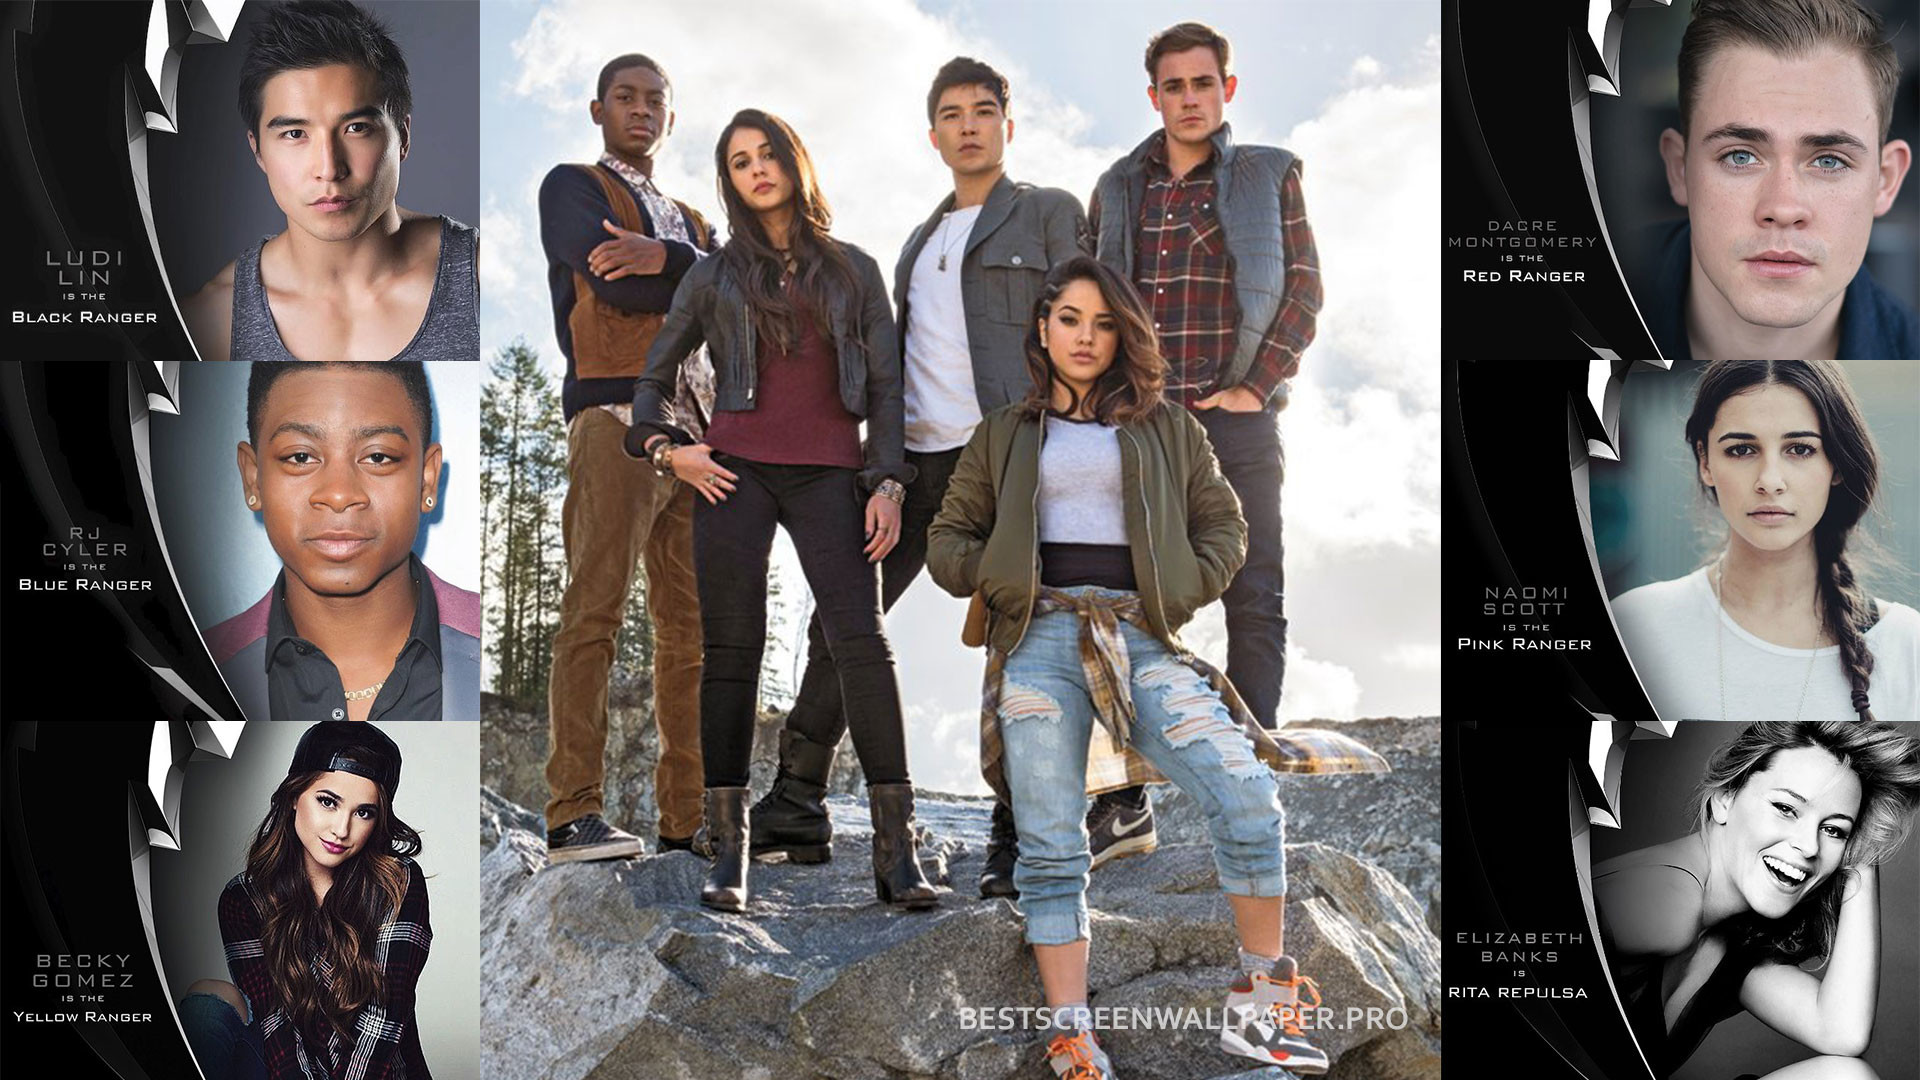 Power Rangers movie wallpaper HD film 2017 poster image